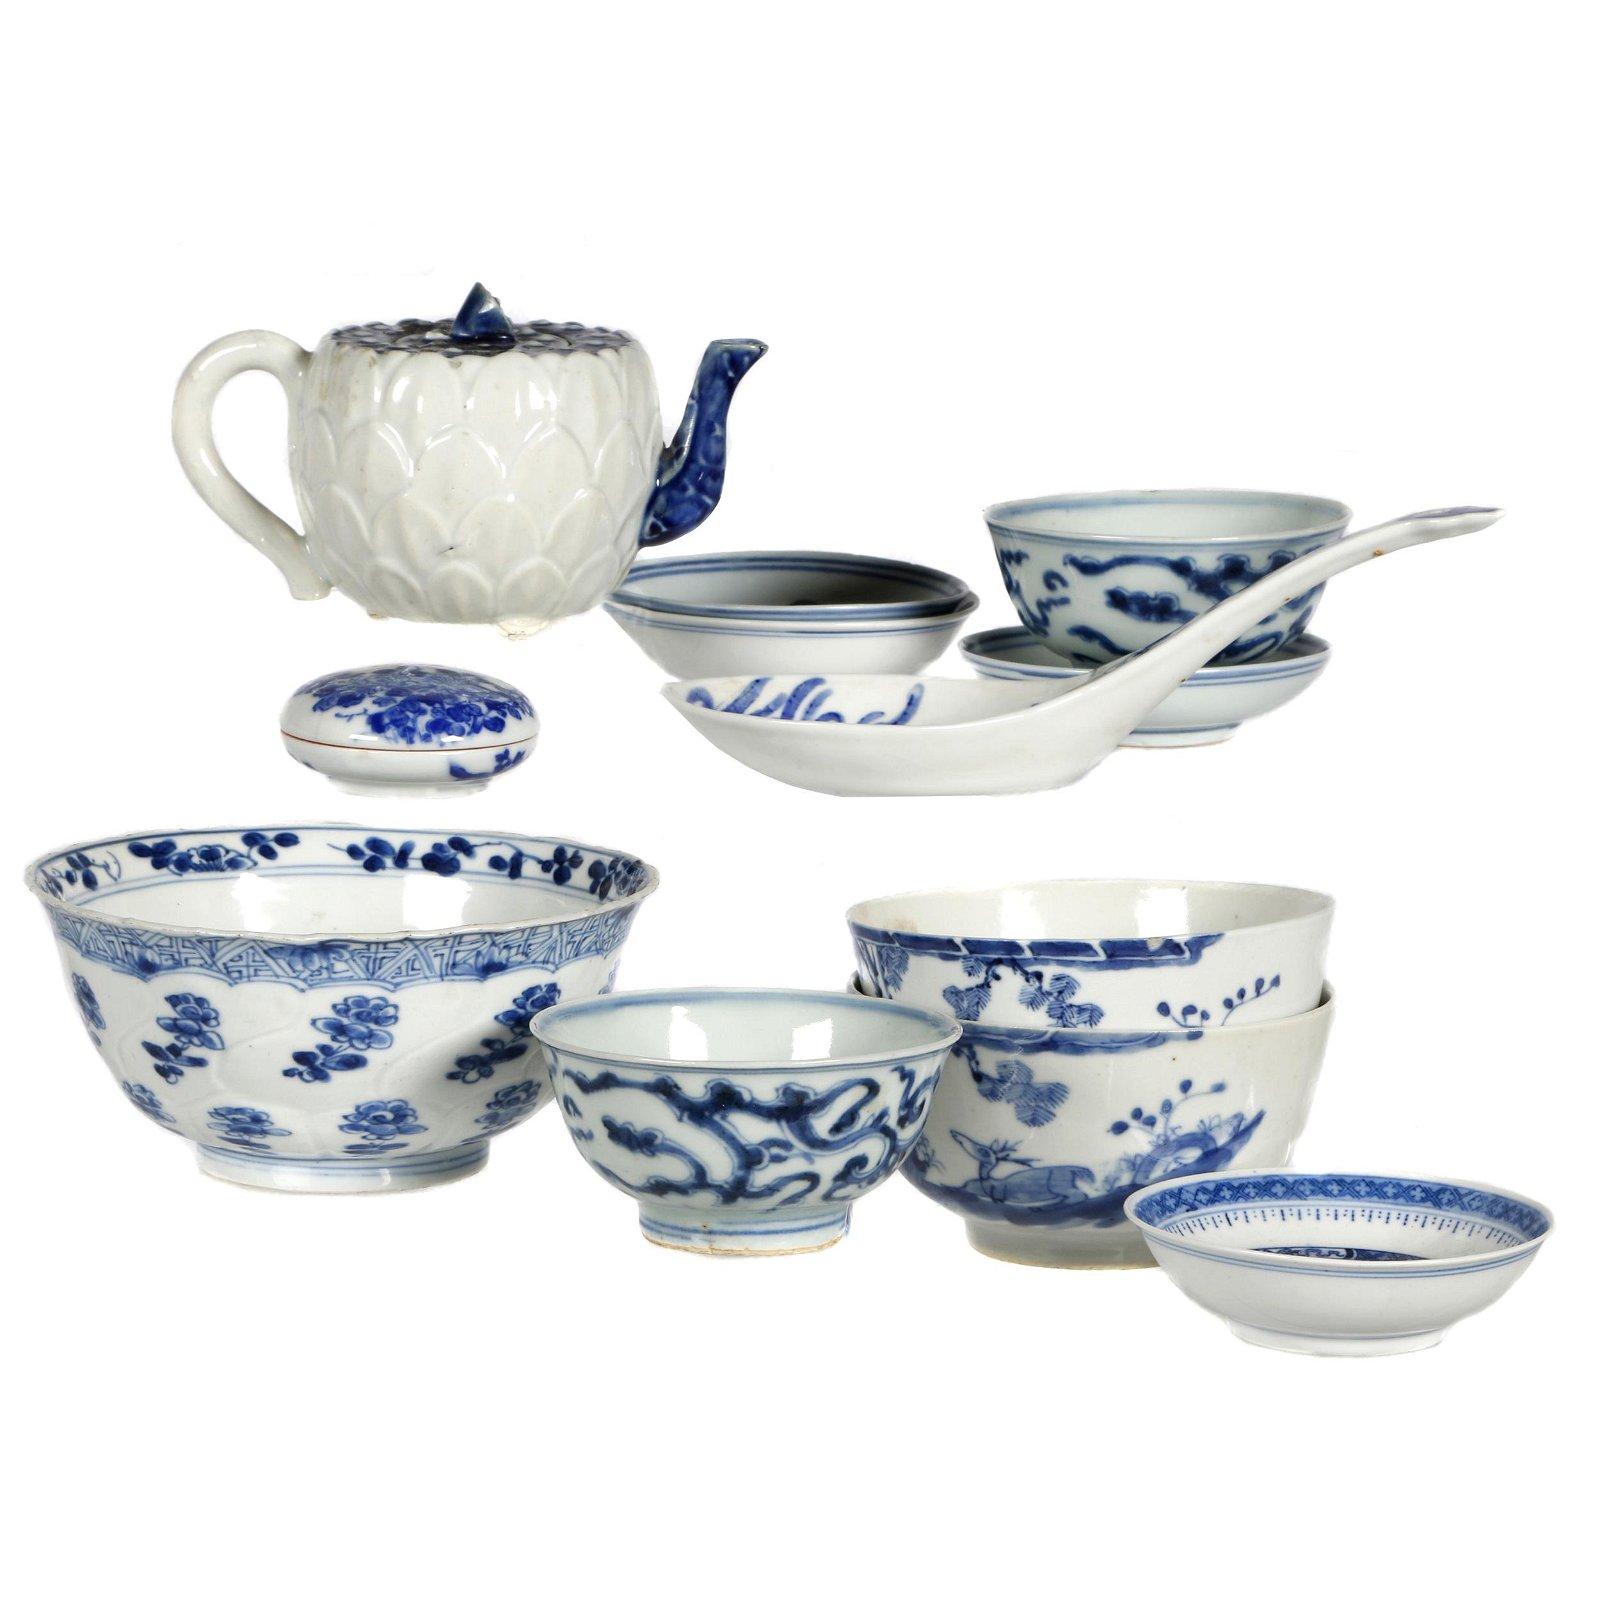 Group of Underglaze Blue Porcelains, Qing dynasty